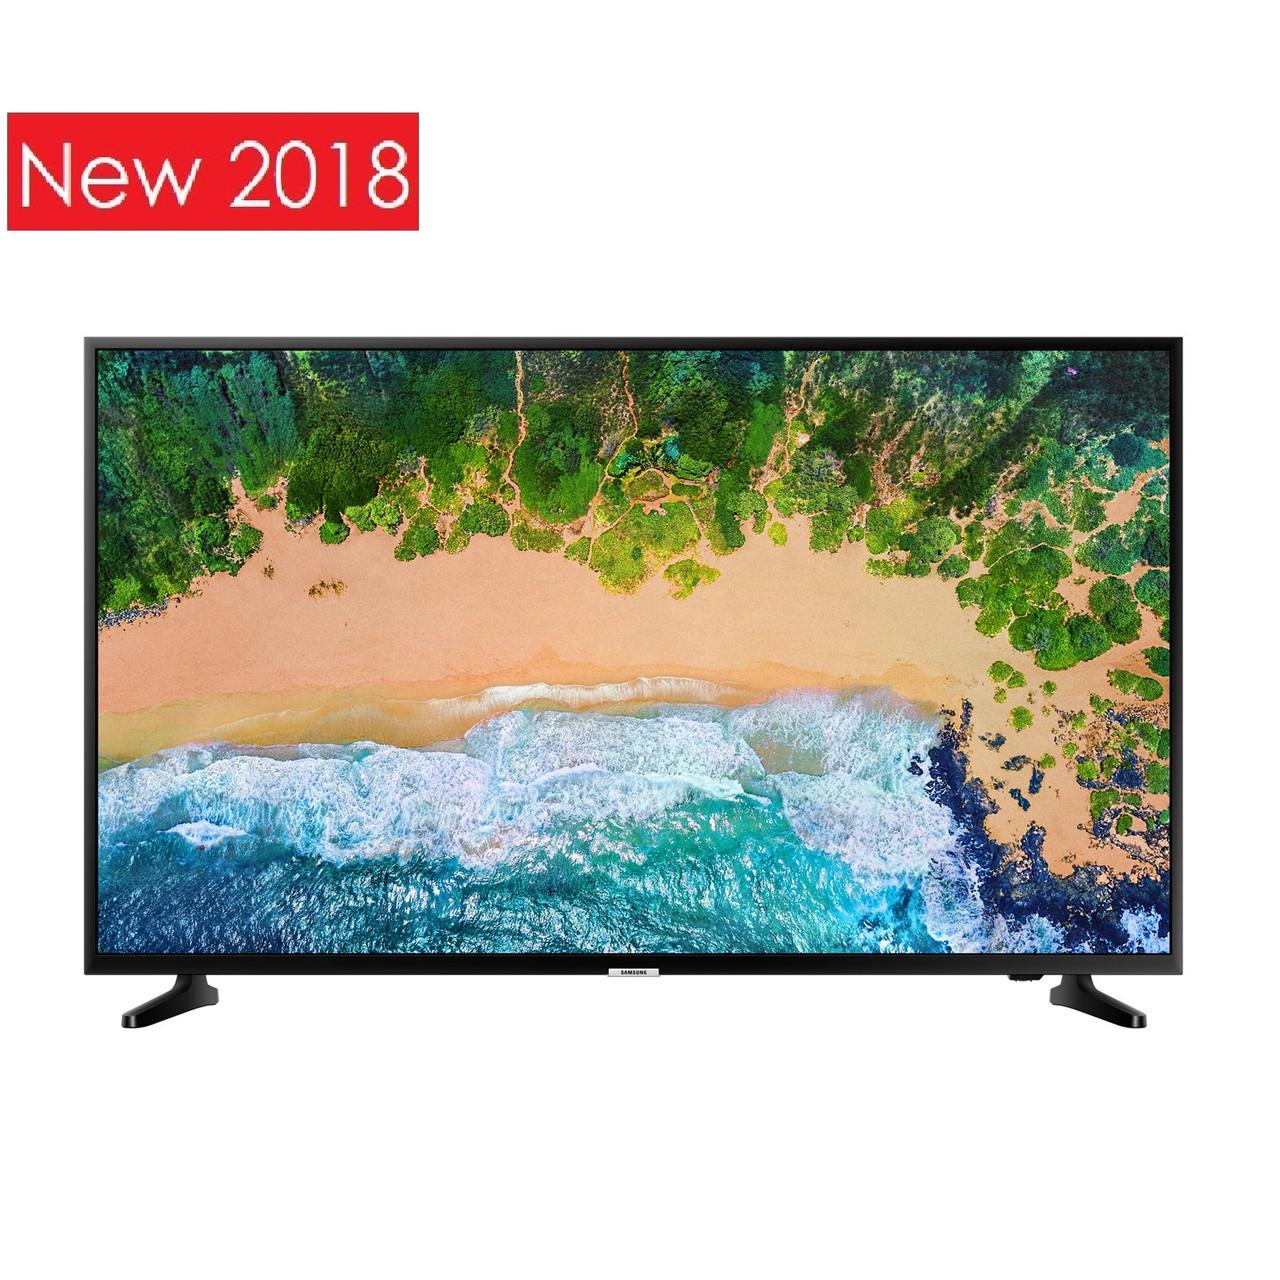 Телевизор Samsung UE50NU7092 (PQI 1300Гц, 4K Smart, UHD Engine, HLG, HDR10+, Dolby Digital+ 20Вт, DVB-C/T2/S2)